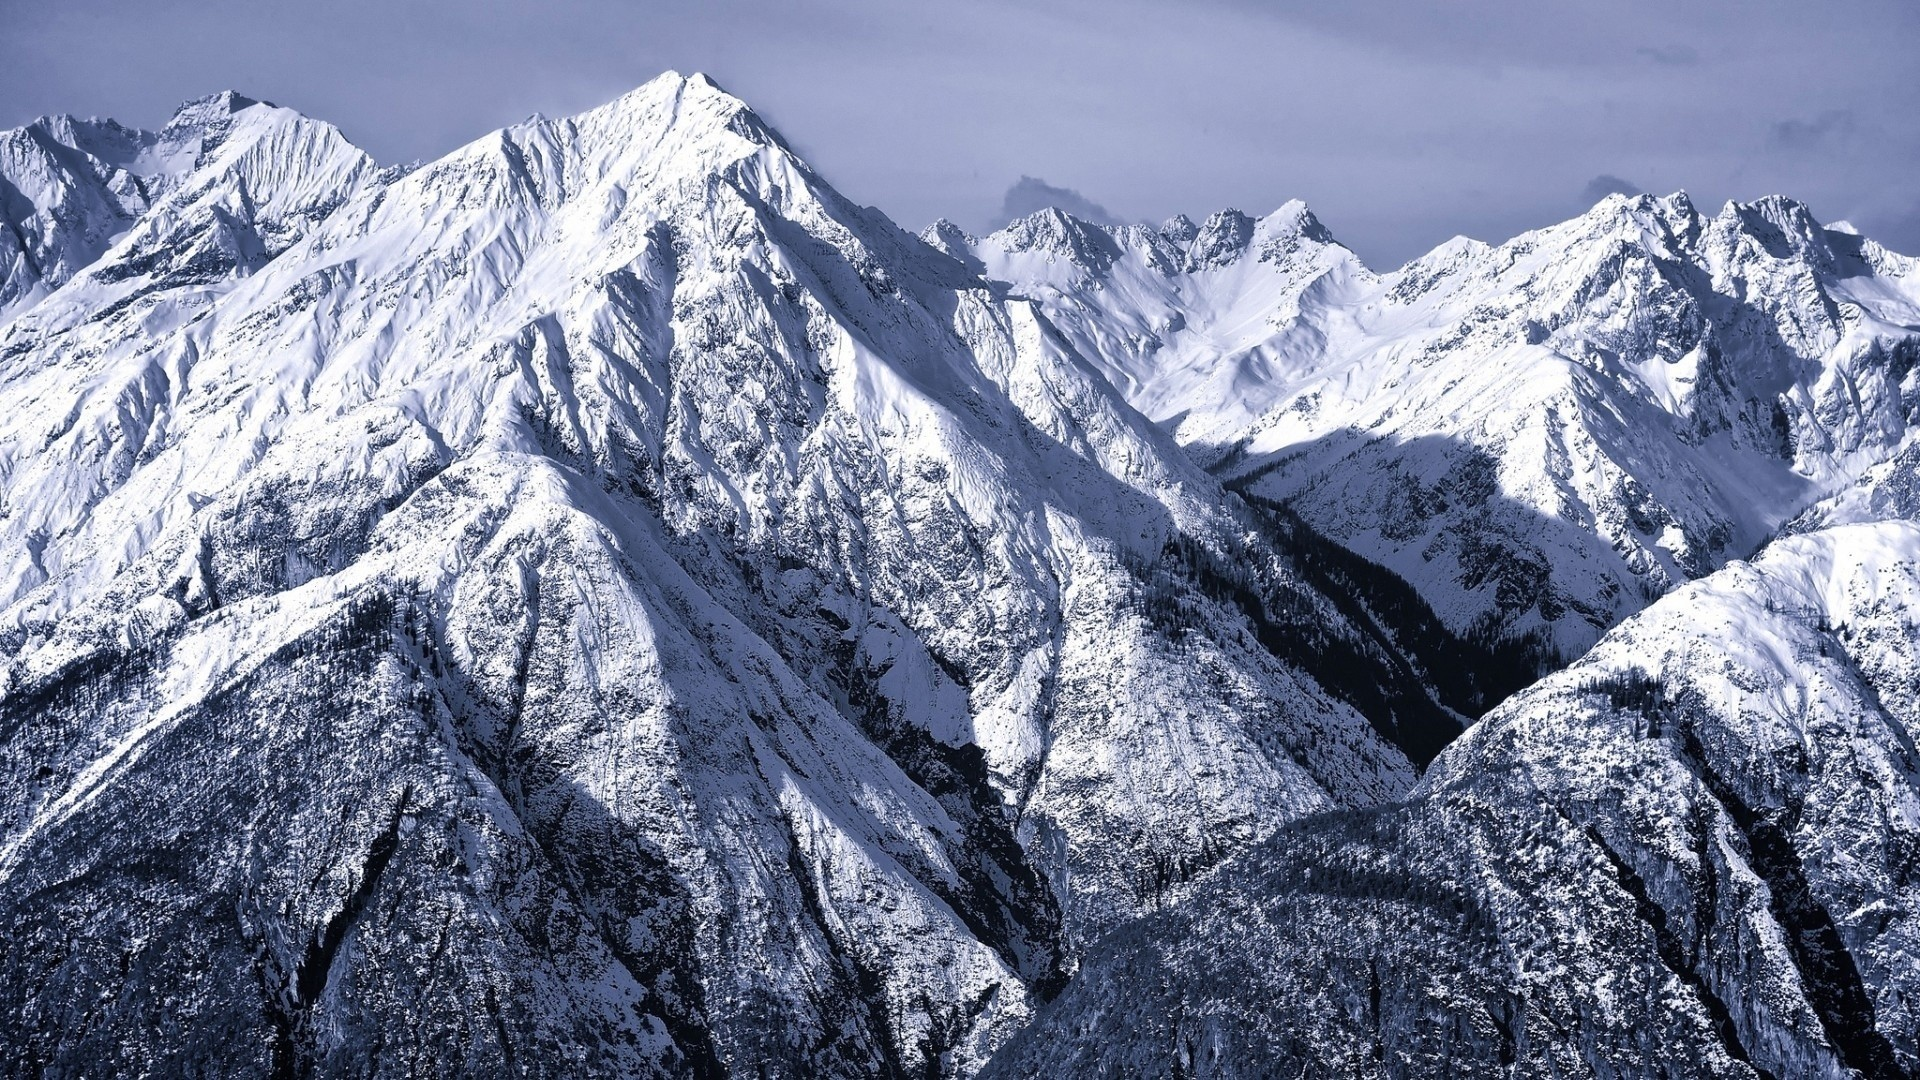 Snow Mountain Full HD Wallpaper